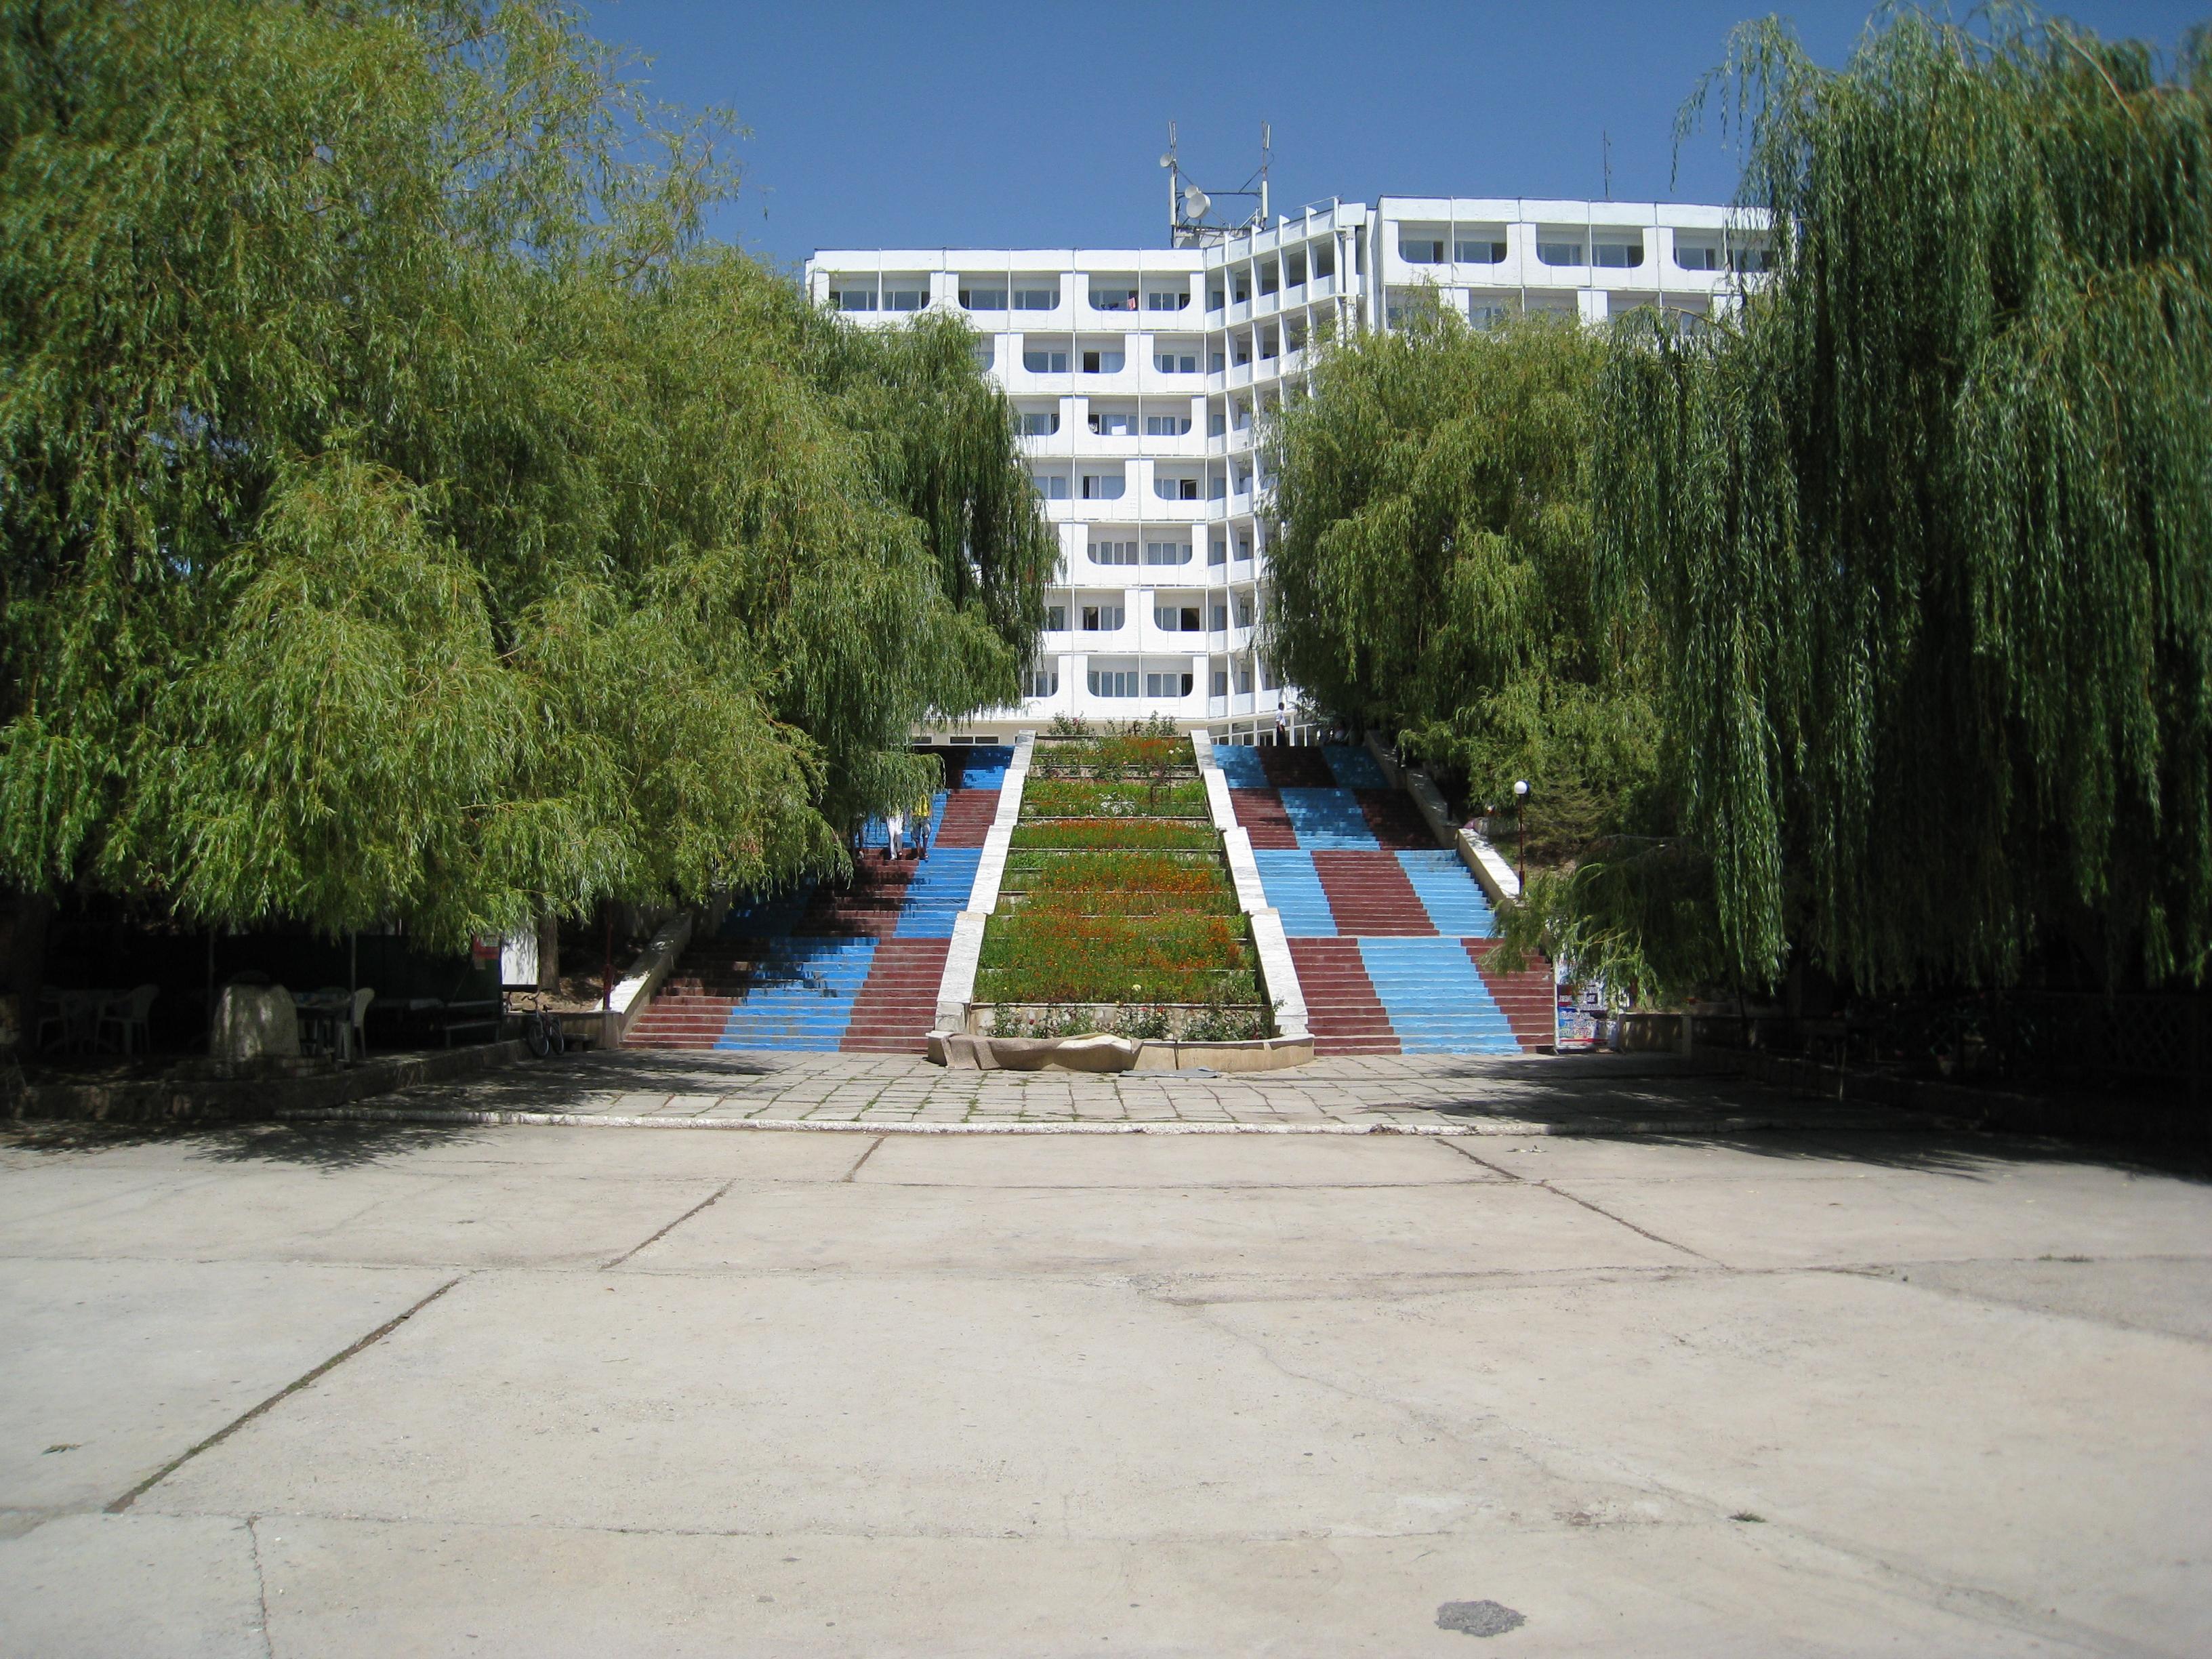 http://photos.wikimapia.org/p/00/04/32/31/68_full.jpg